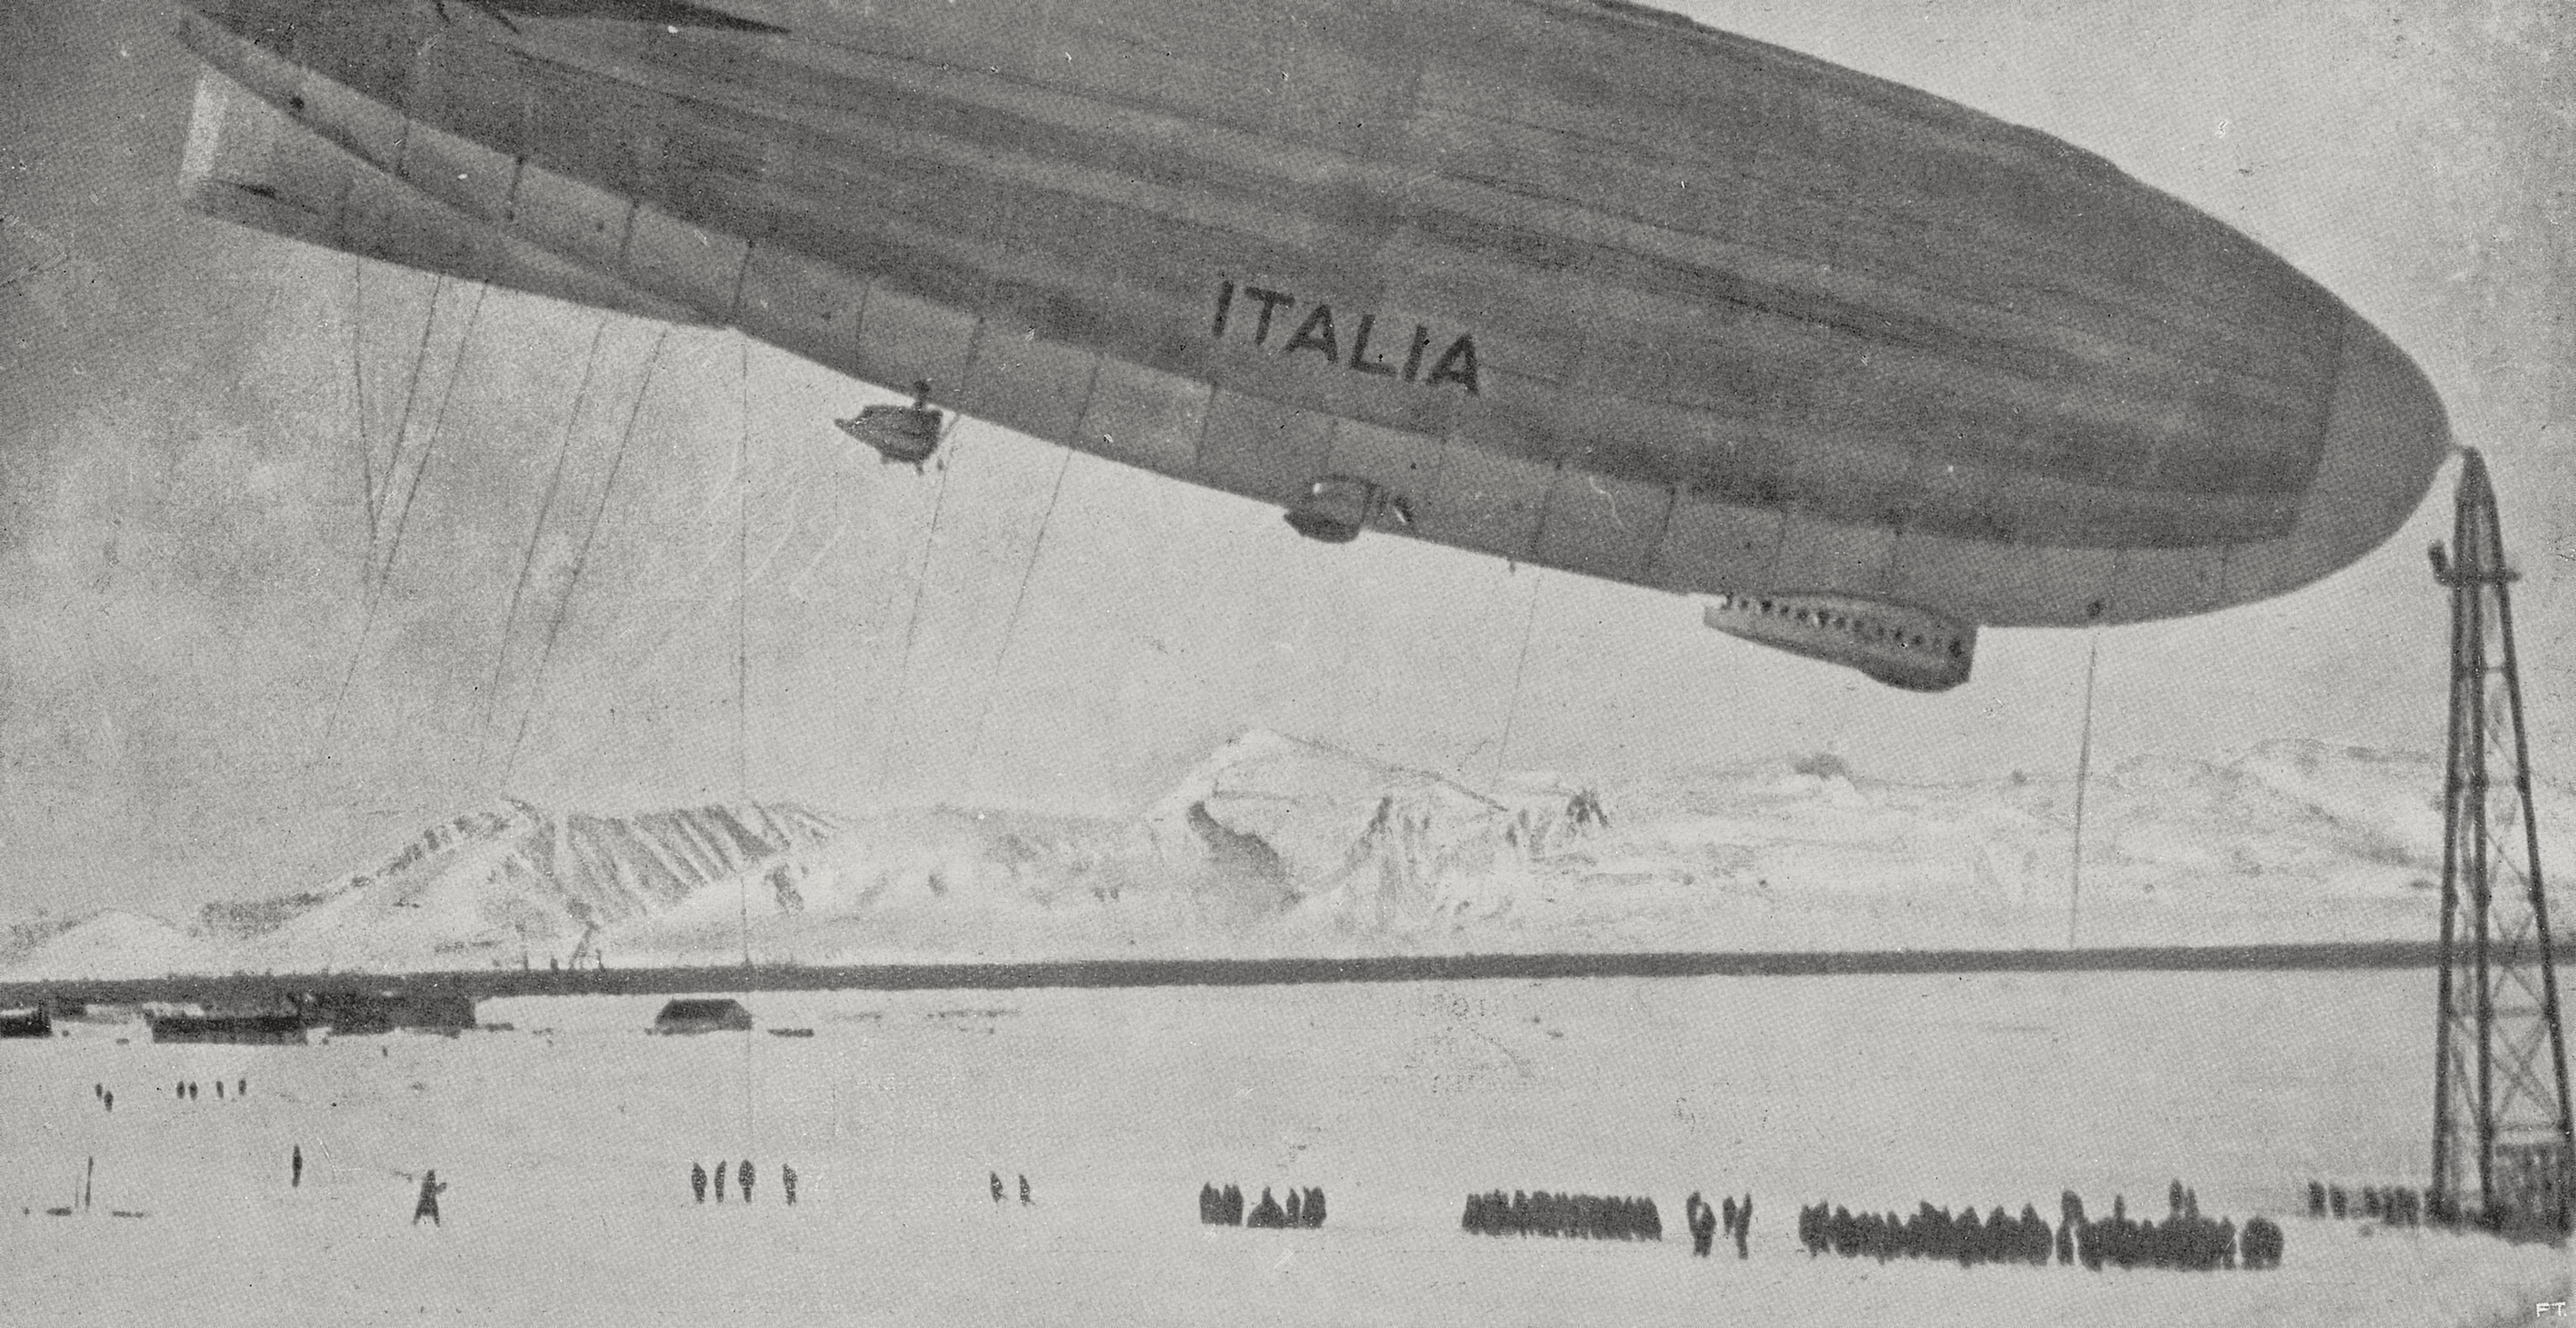 Airship Italia moored in King's bay, Spitsbergen island, Norway, from L'Illustrazione Italiana, Year LV, No 23, June 3, 1928.